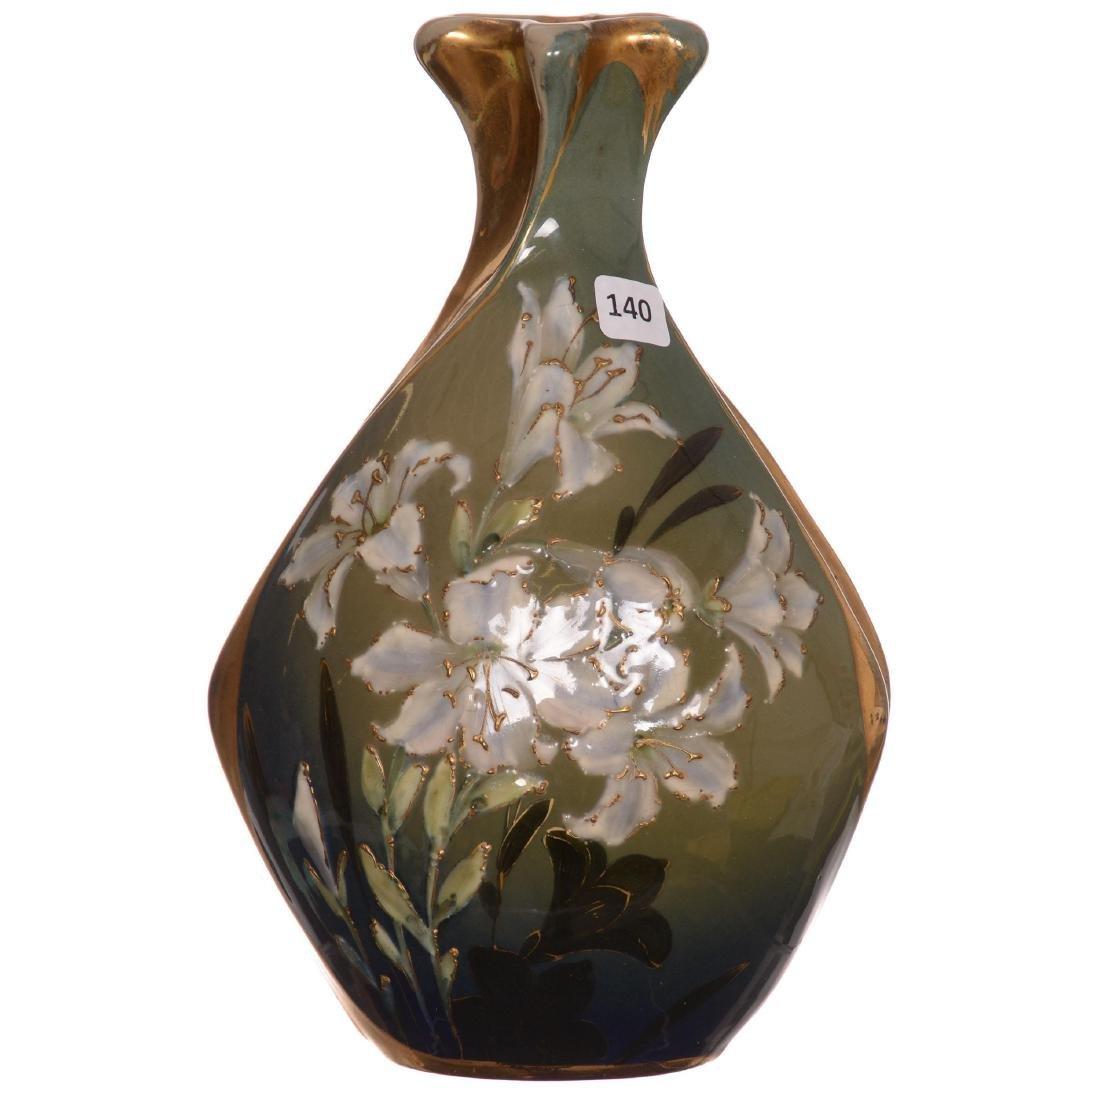 Amphora Teplitz Vase